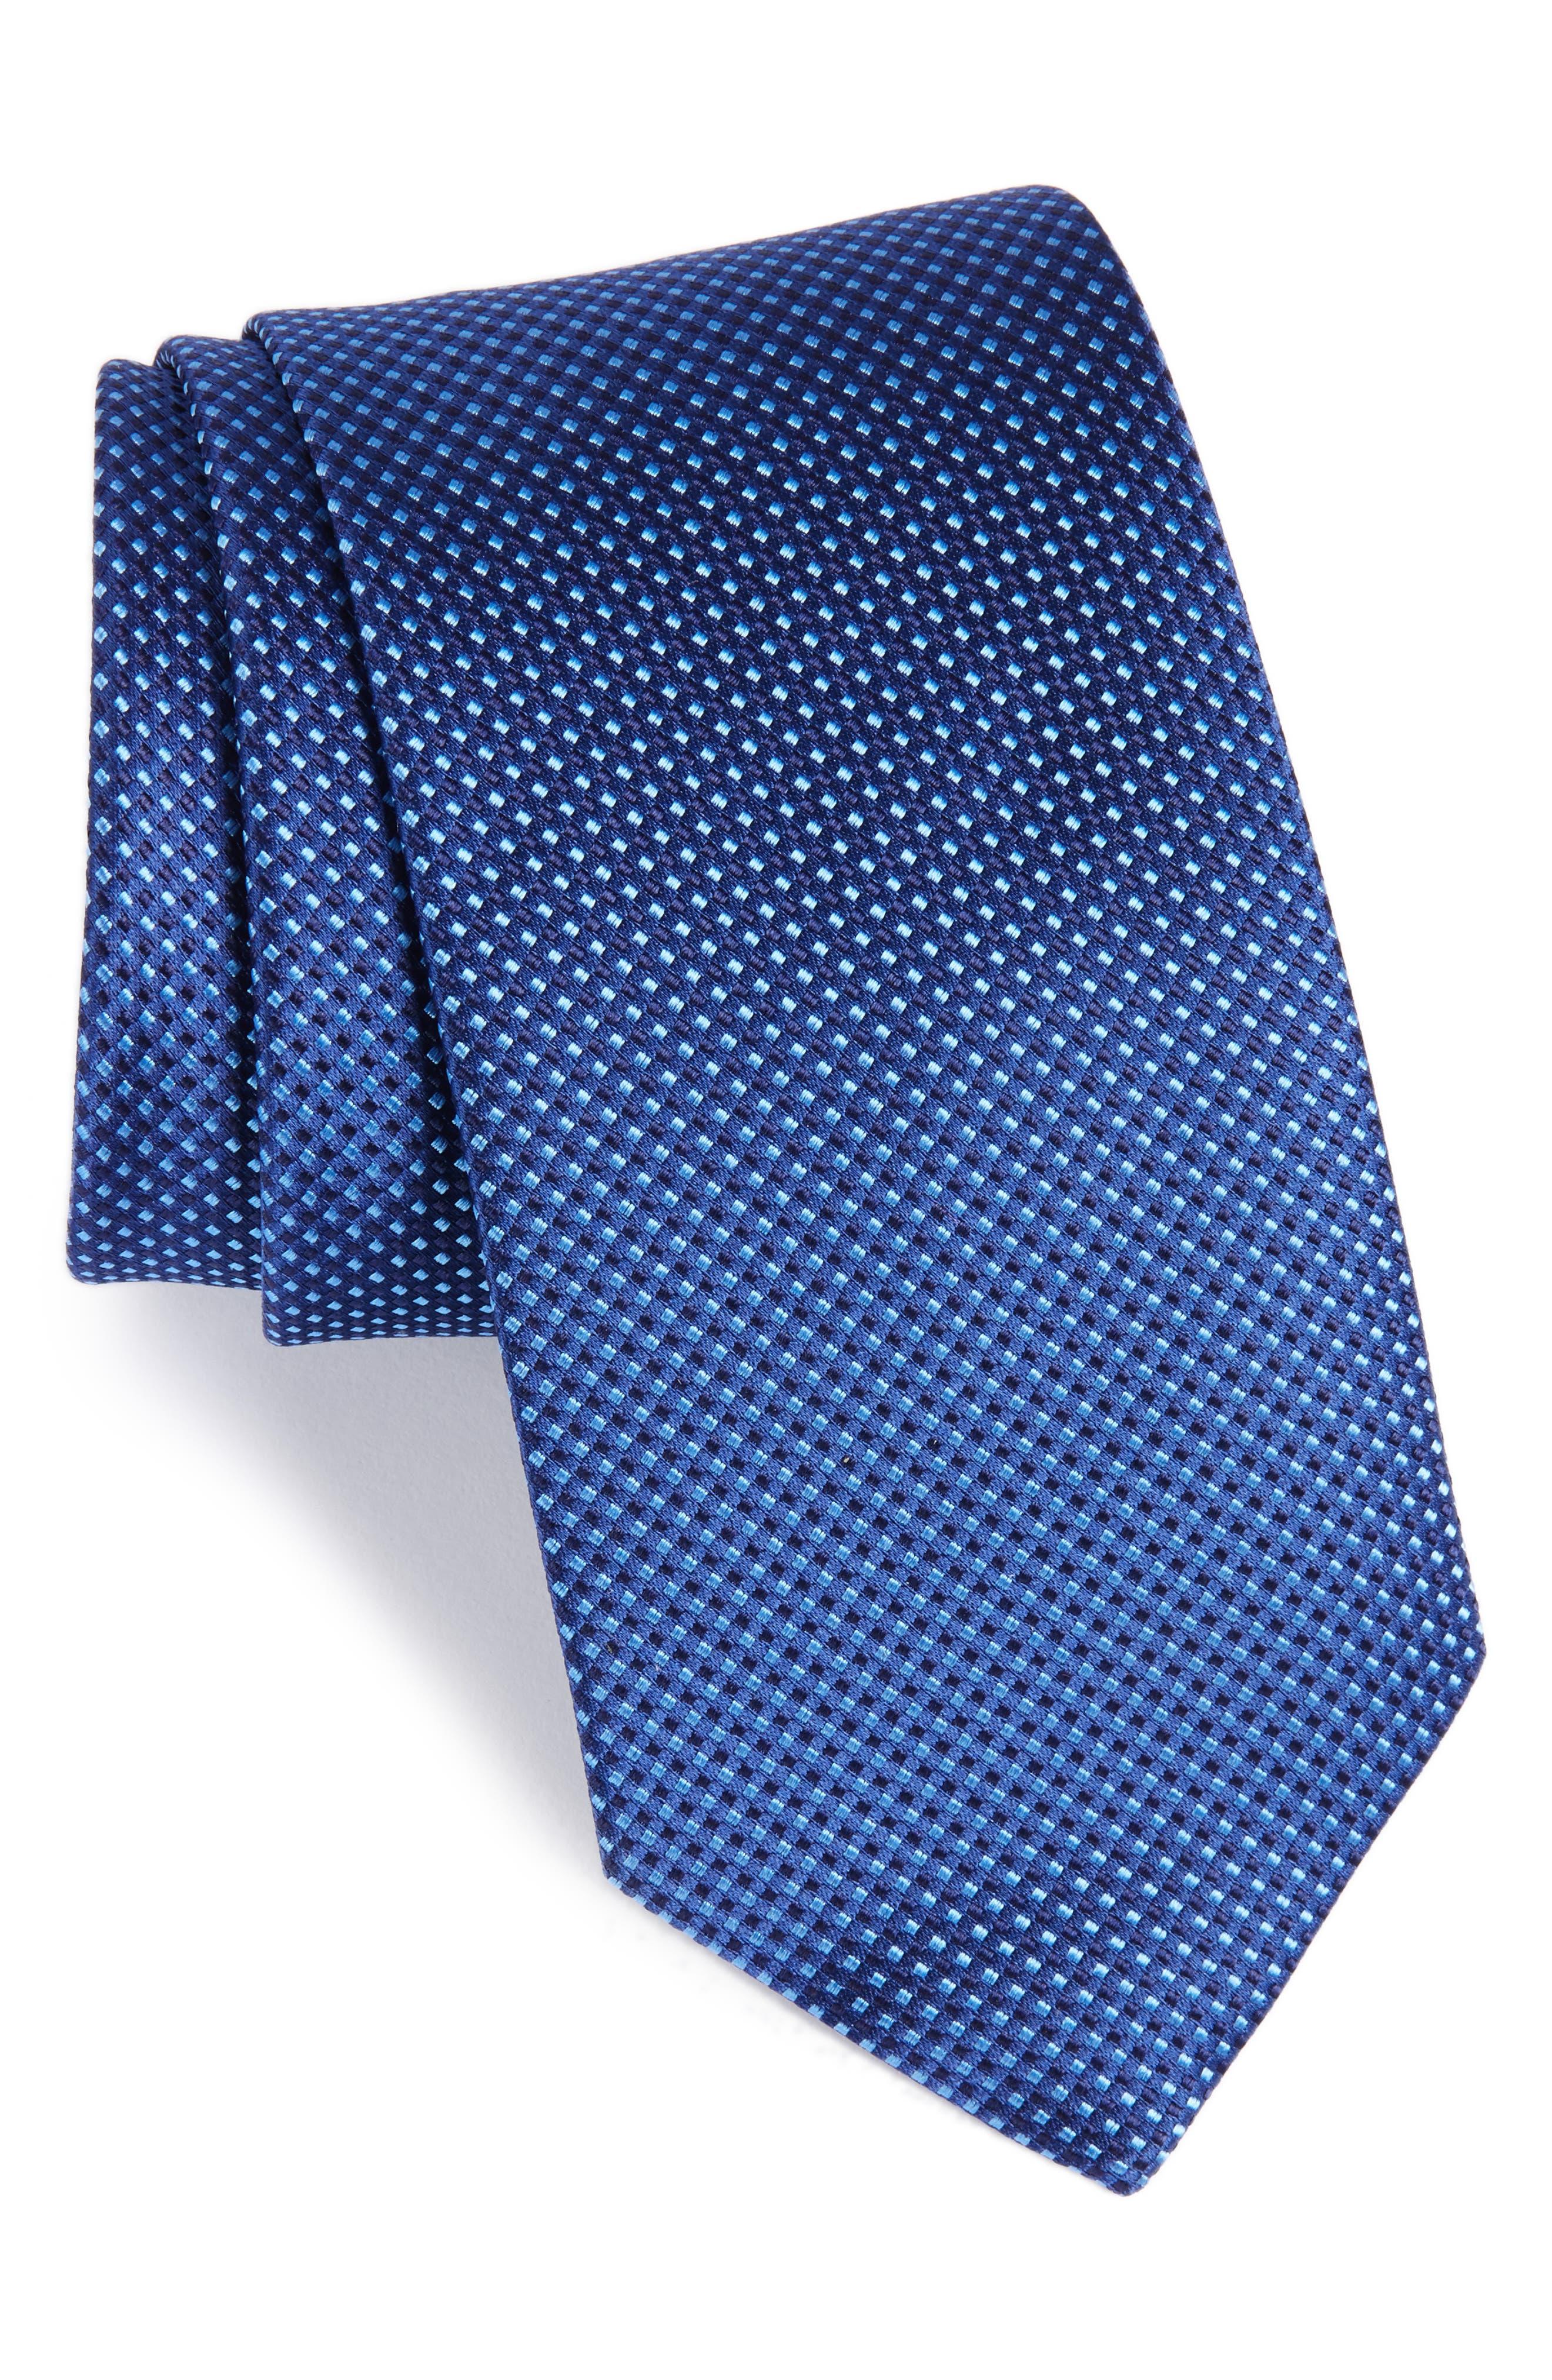 Microdot Silk Tie,                             Main thumbnail 1, color,                             400